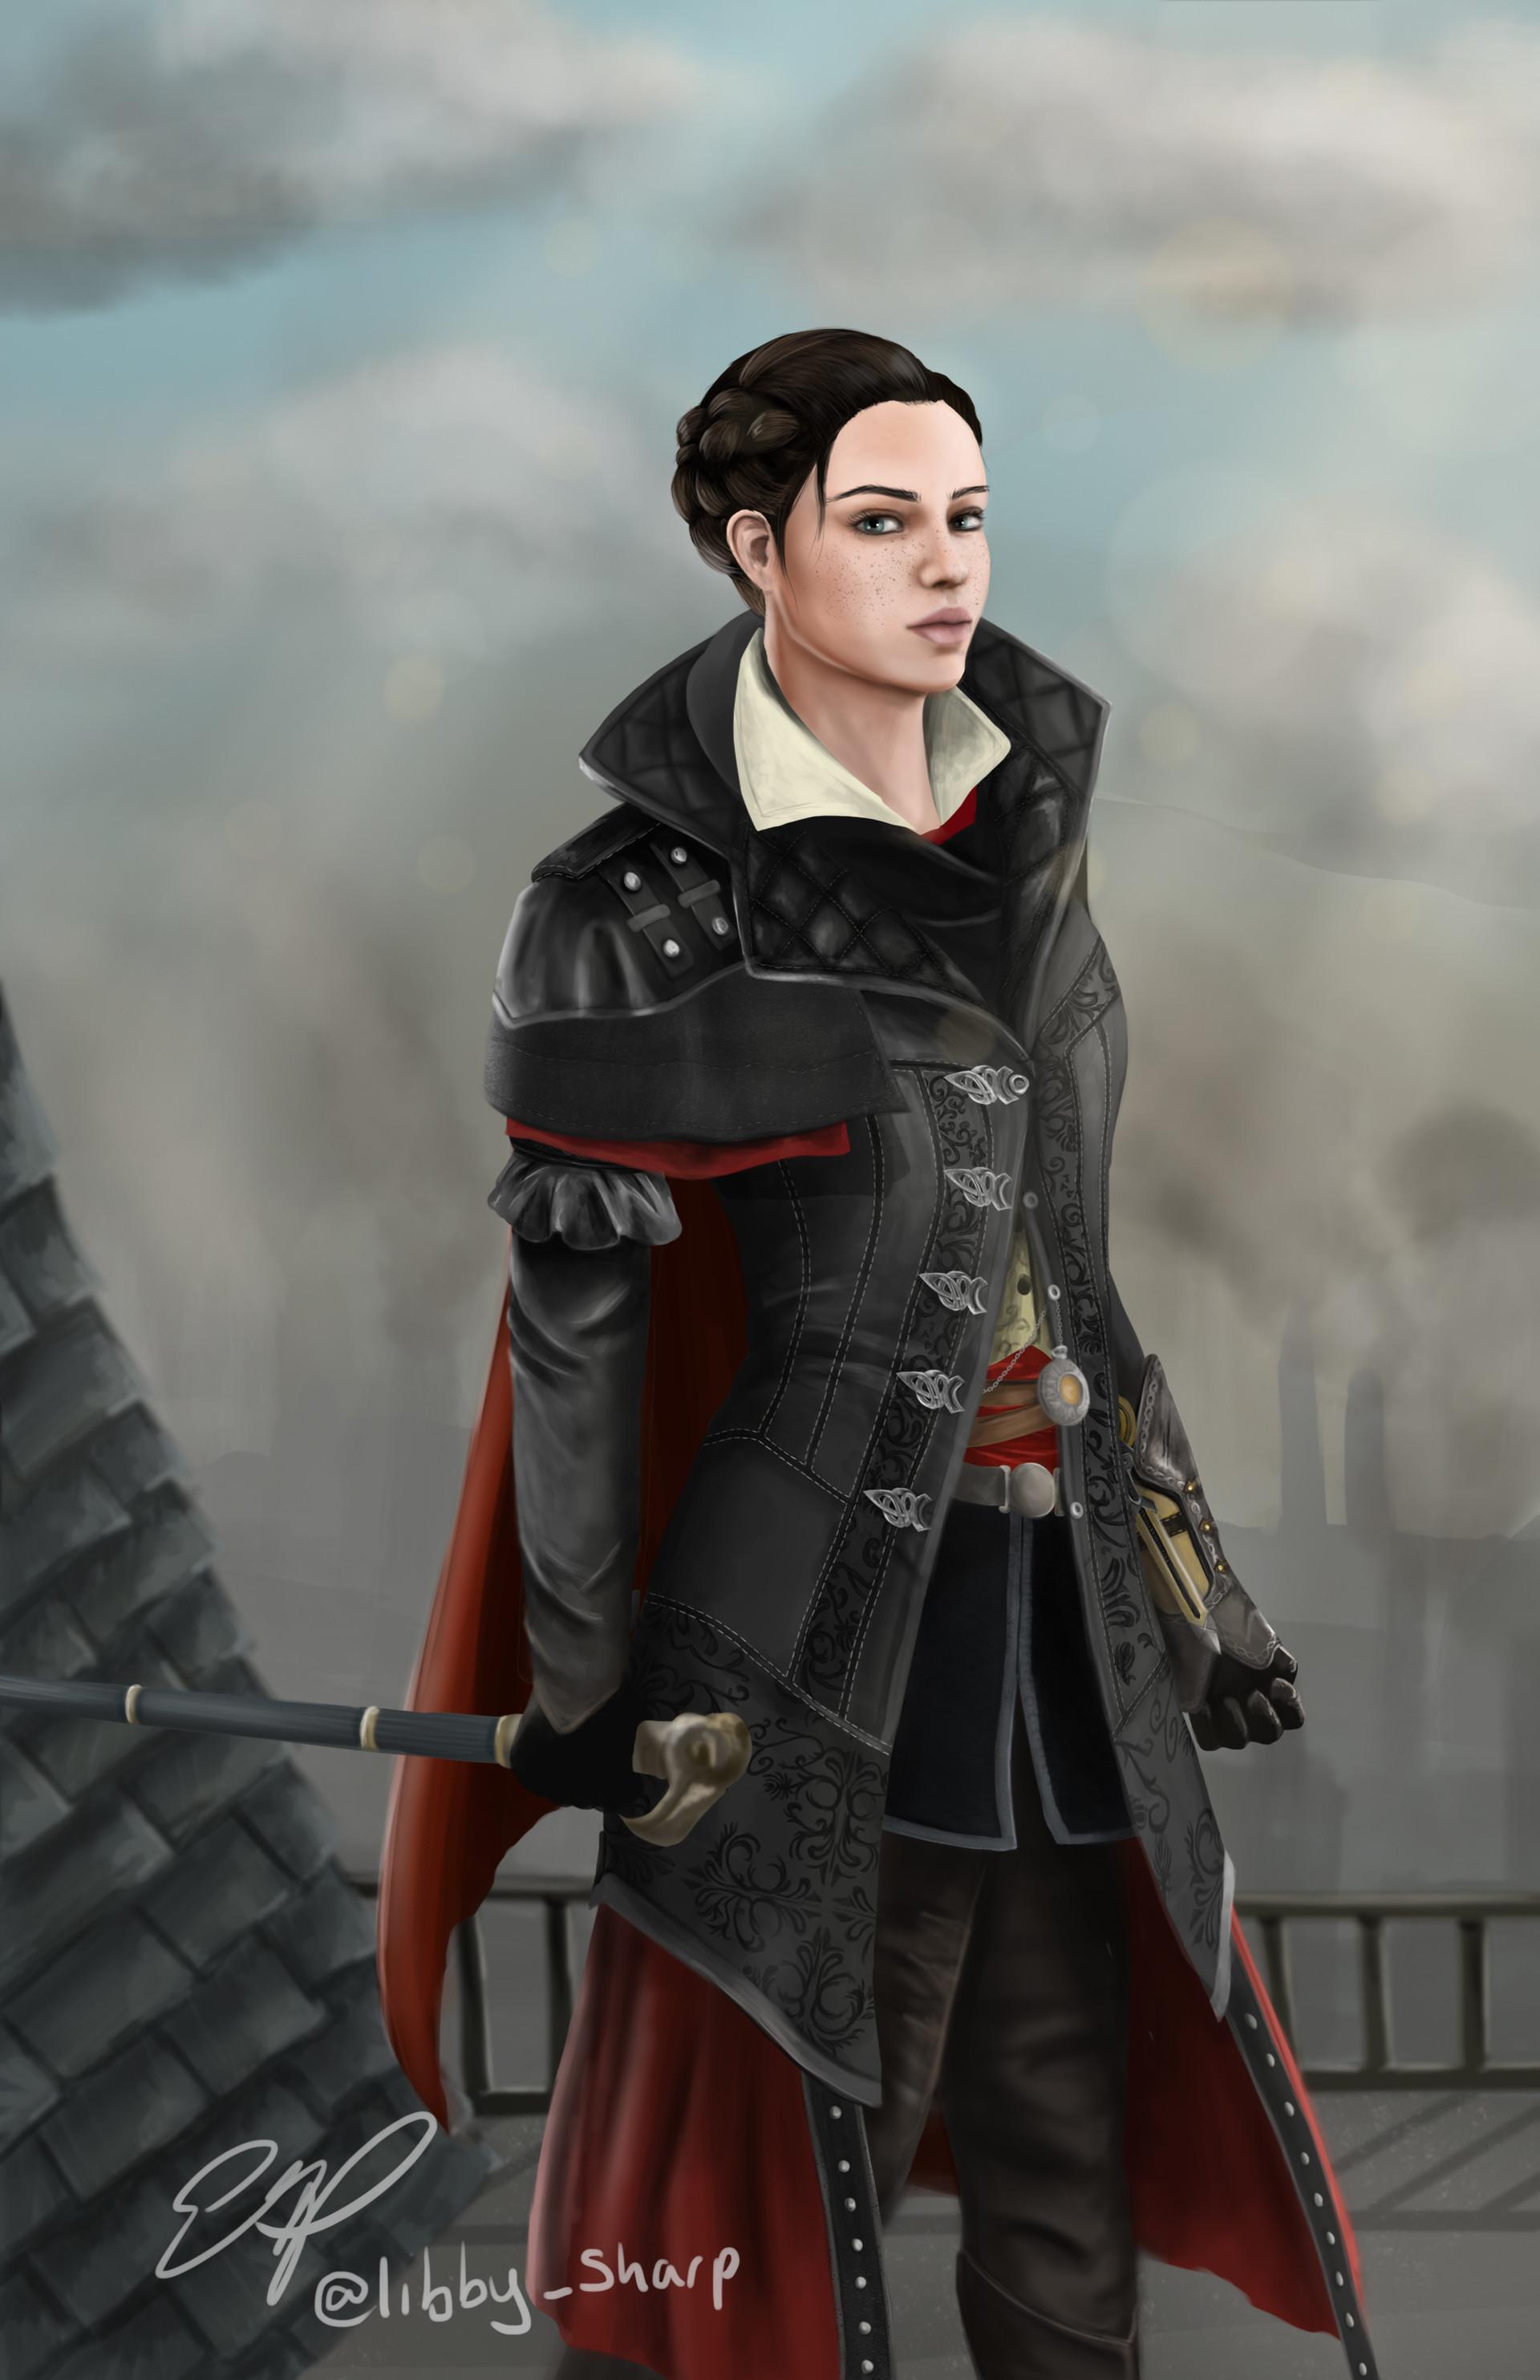 Elizabeth Sharp Evie Frye London is waiting to be liberated. elizabeth sharp evie frye